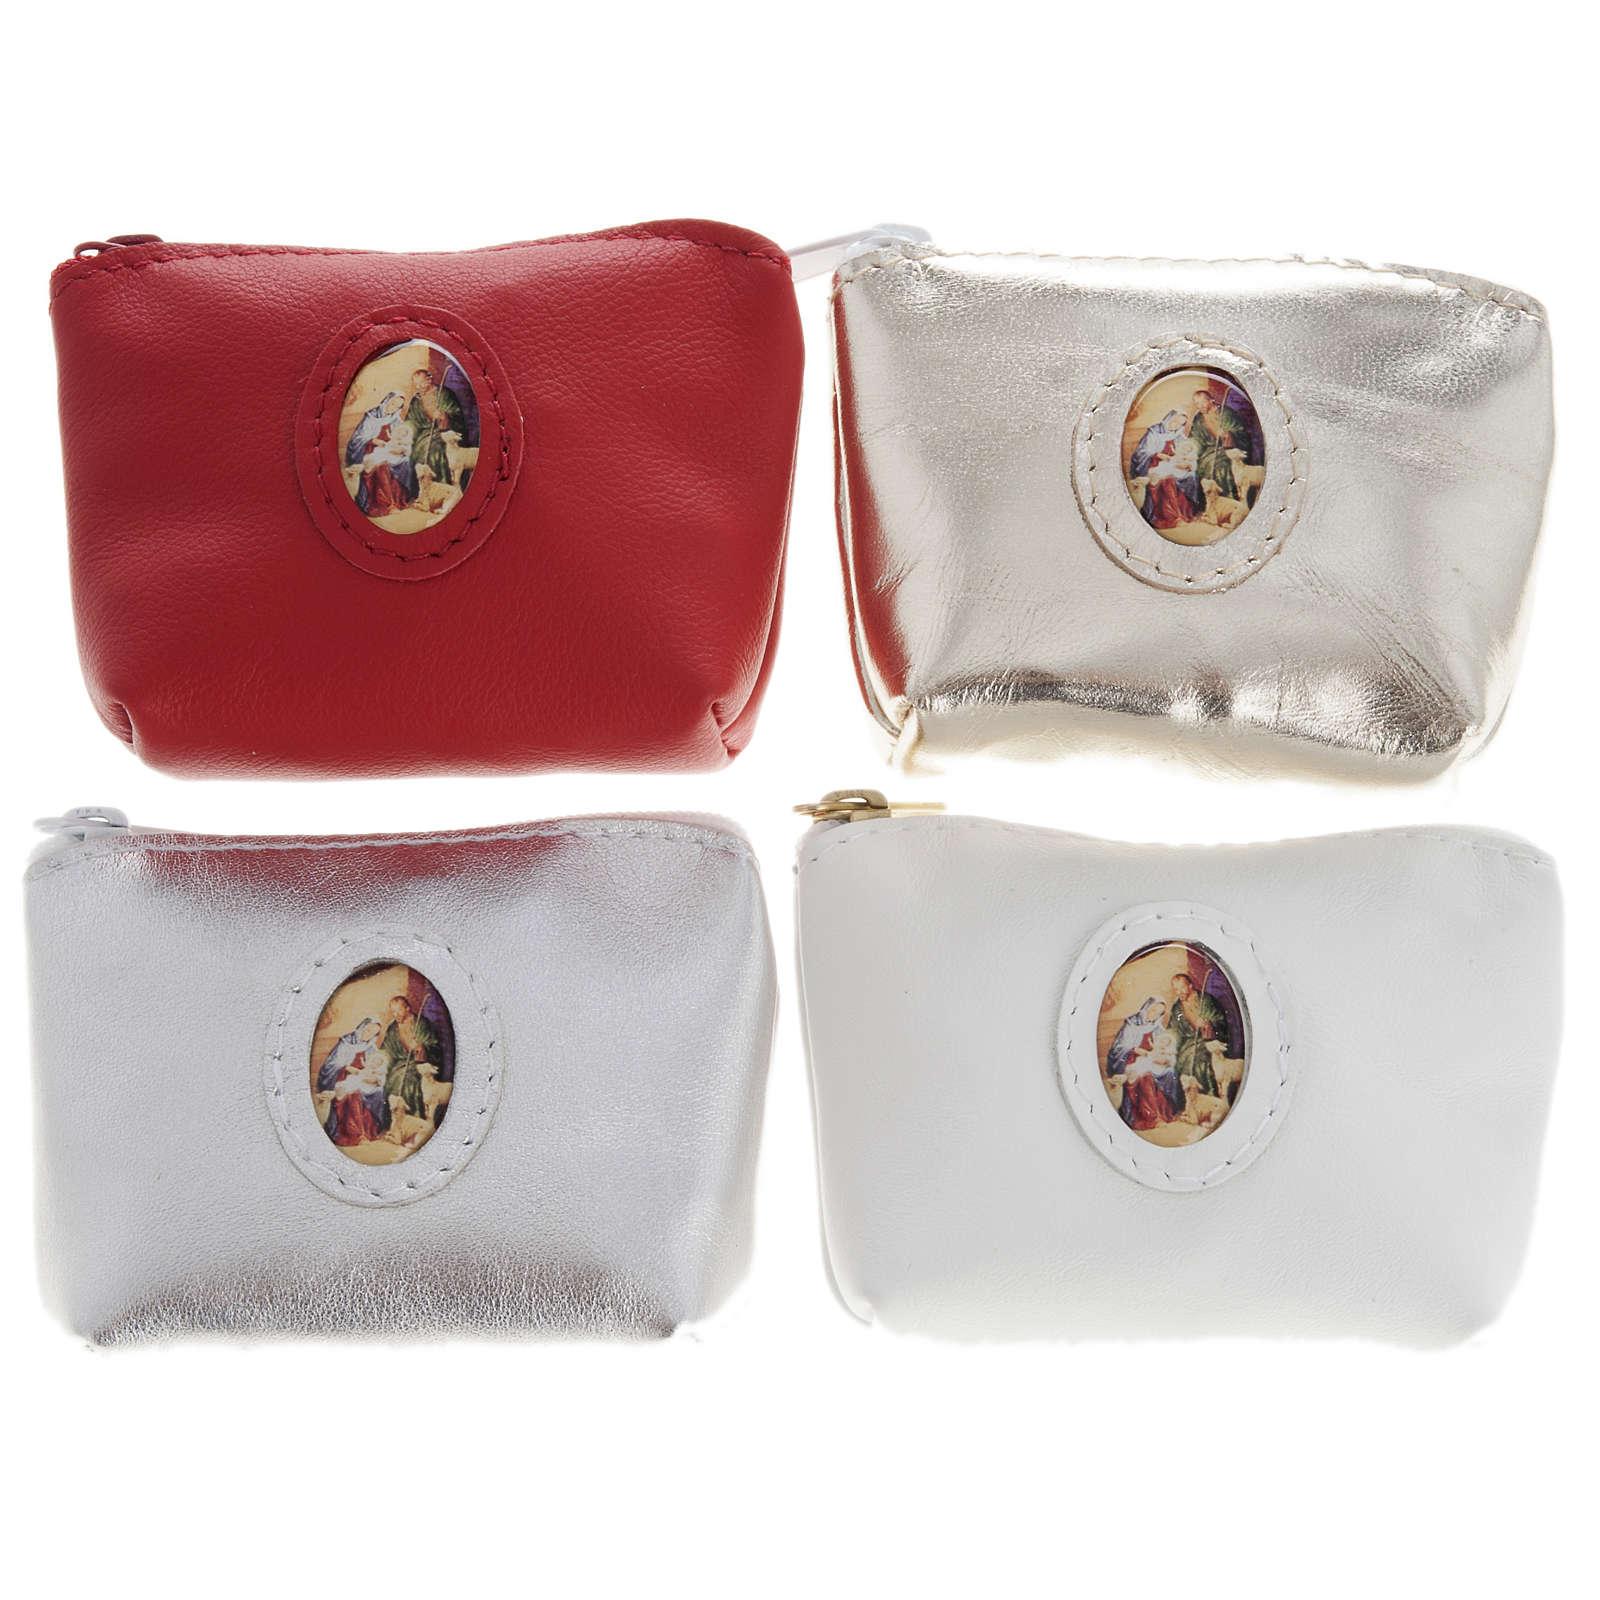 Etui na różaniec torebka na suwak skóra różne kolory 4